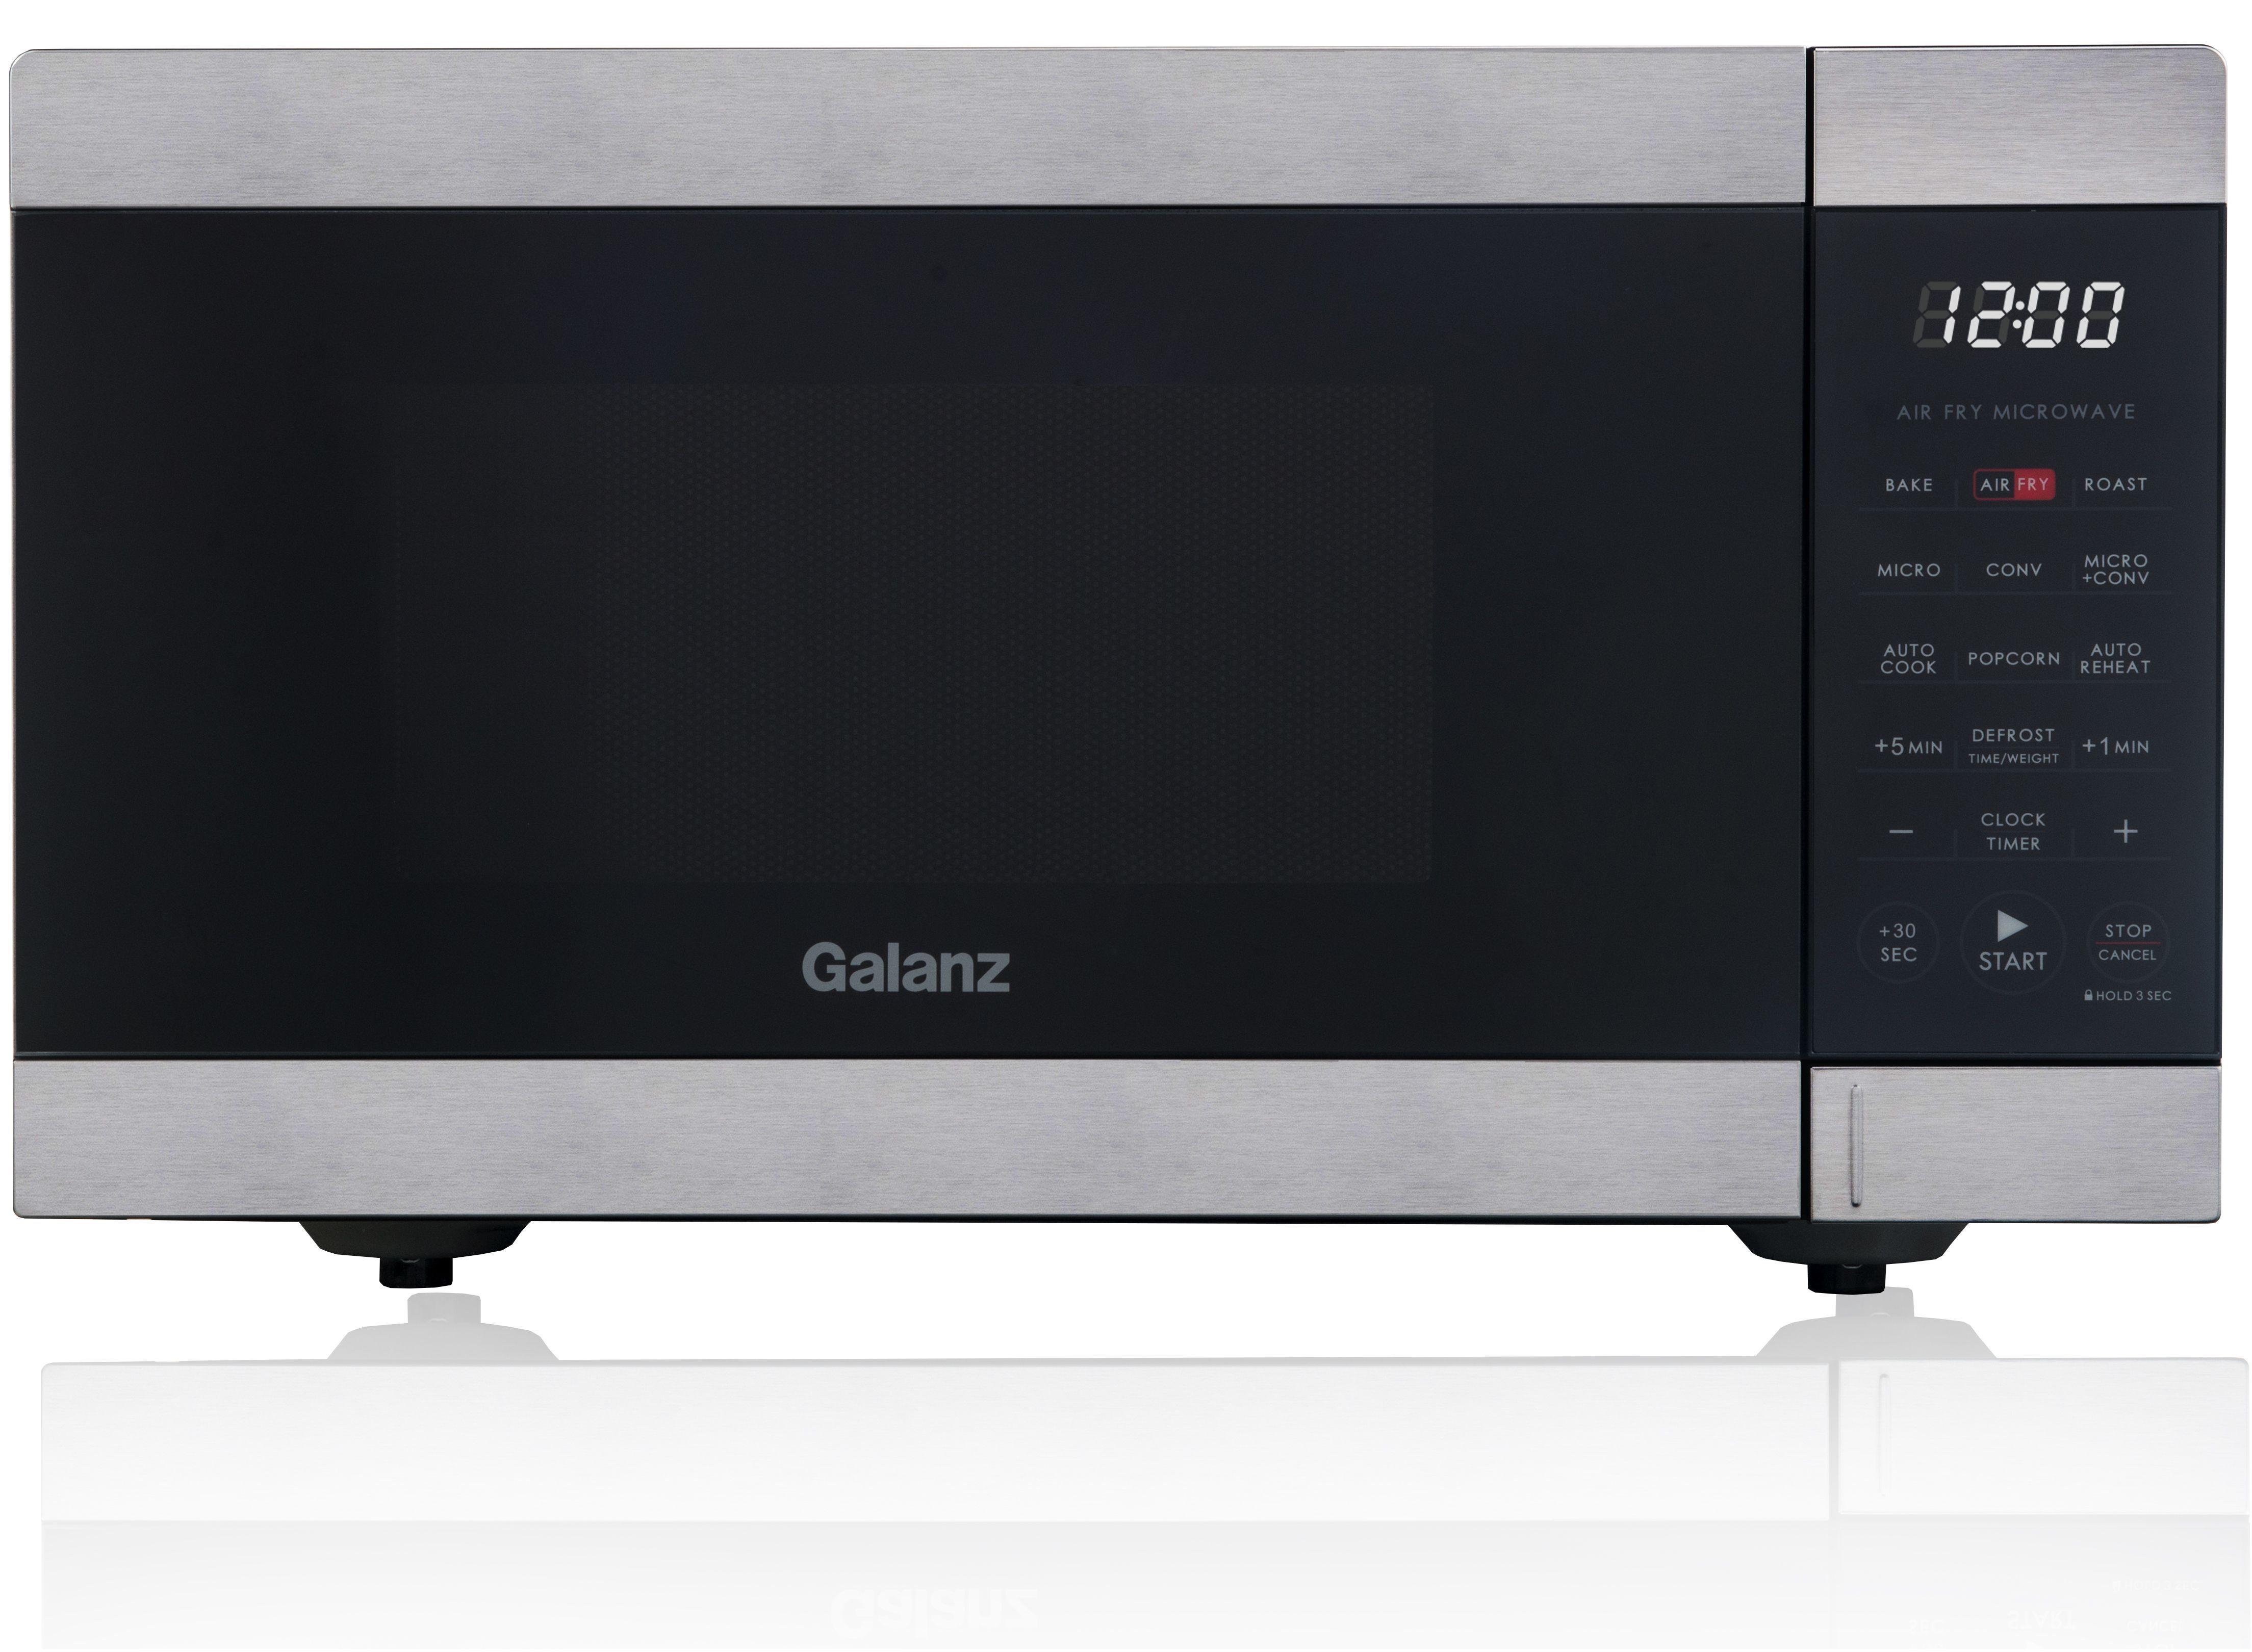 galanz 0 9 cu ft air fry microwave 900